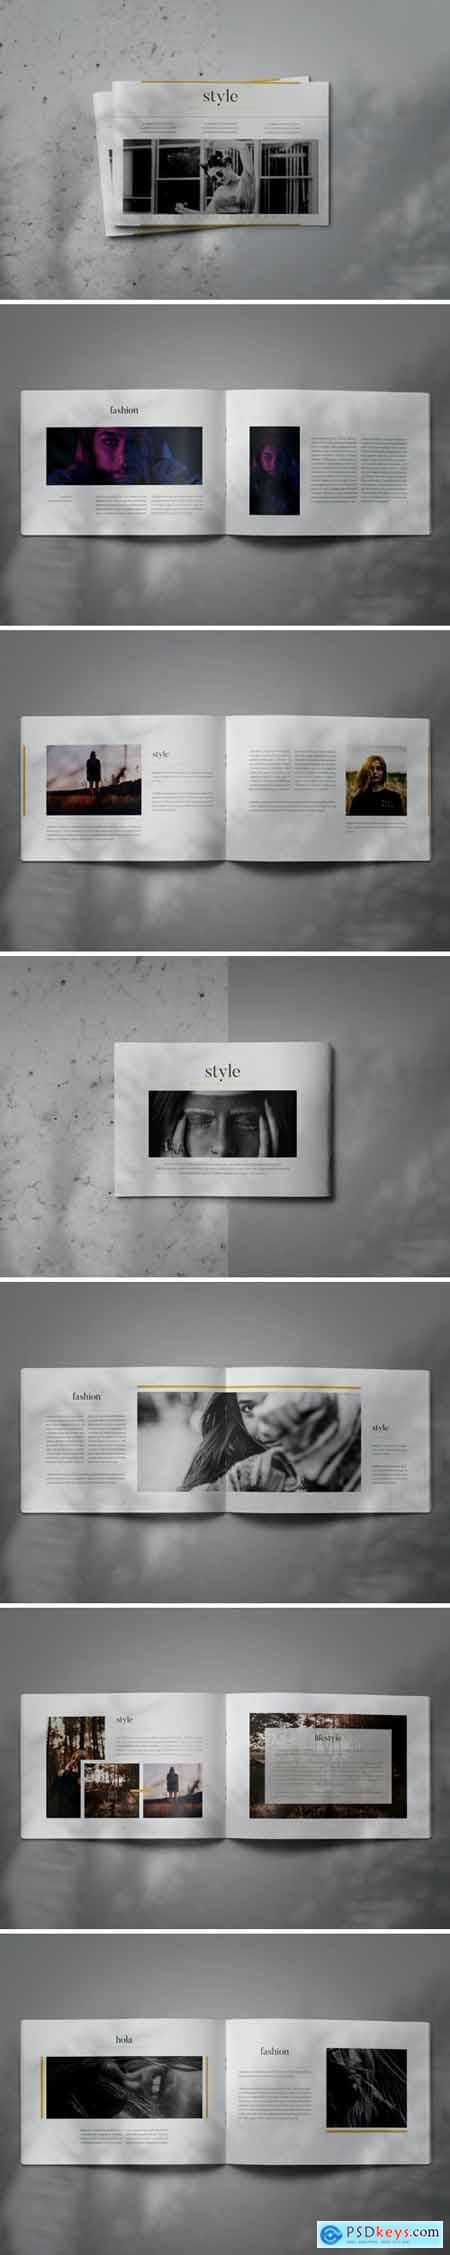 STYLE - Indesign Brochure Lookbook Template